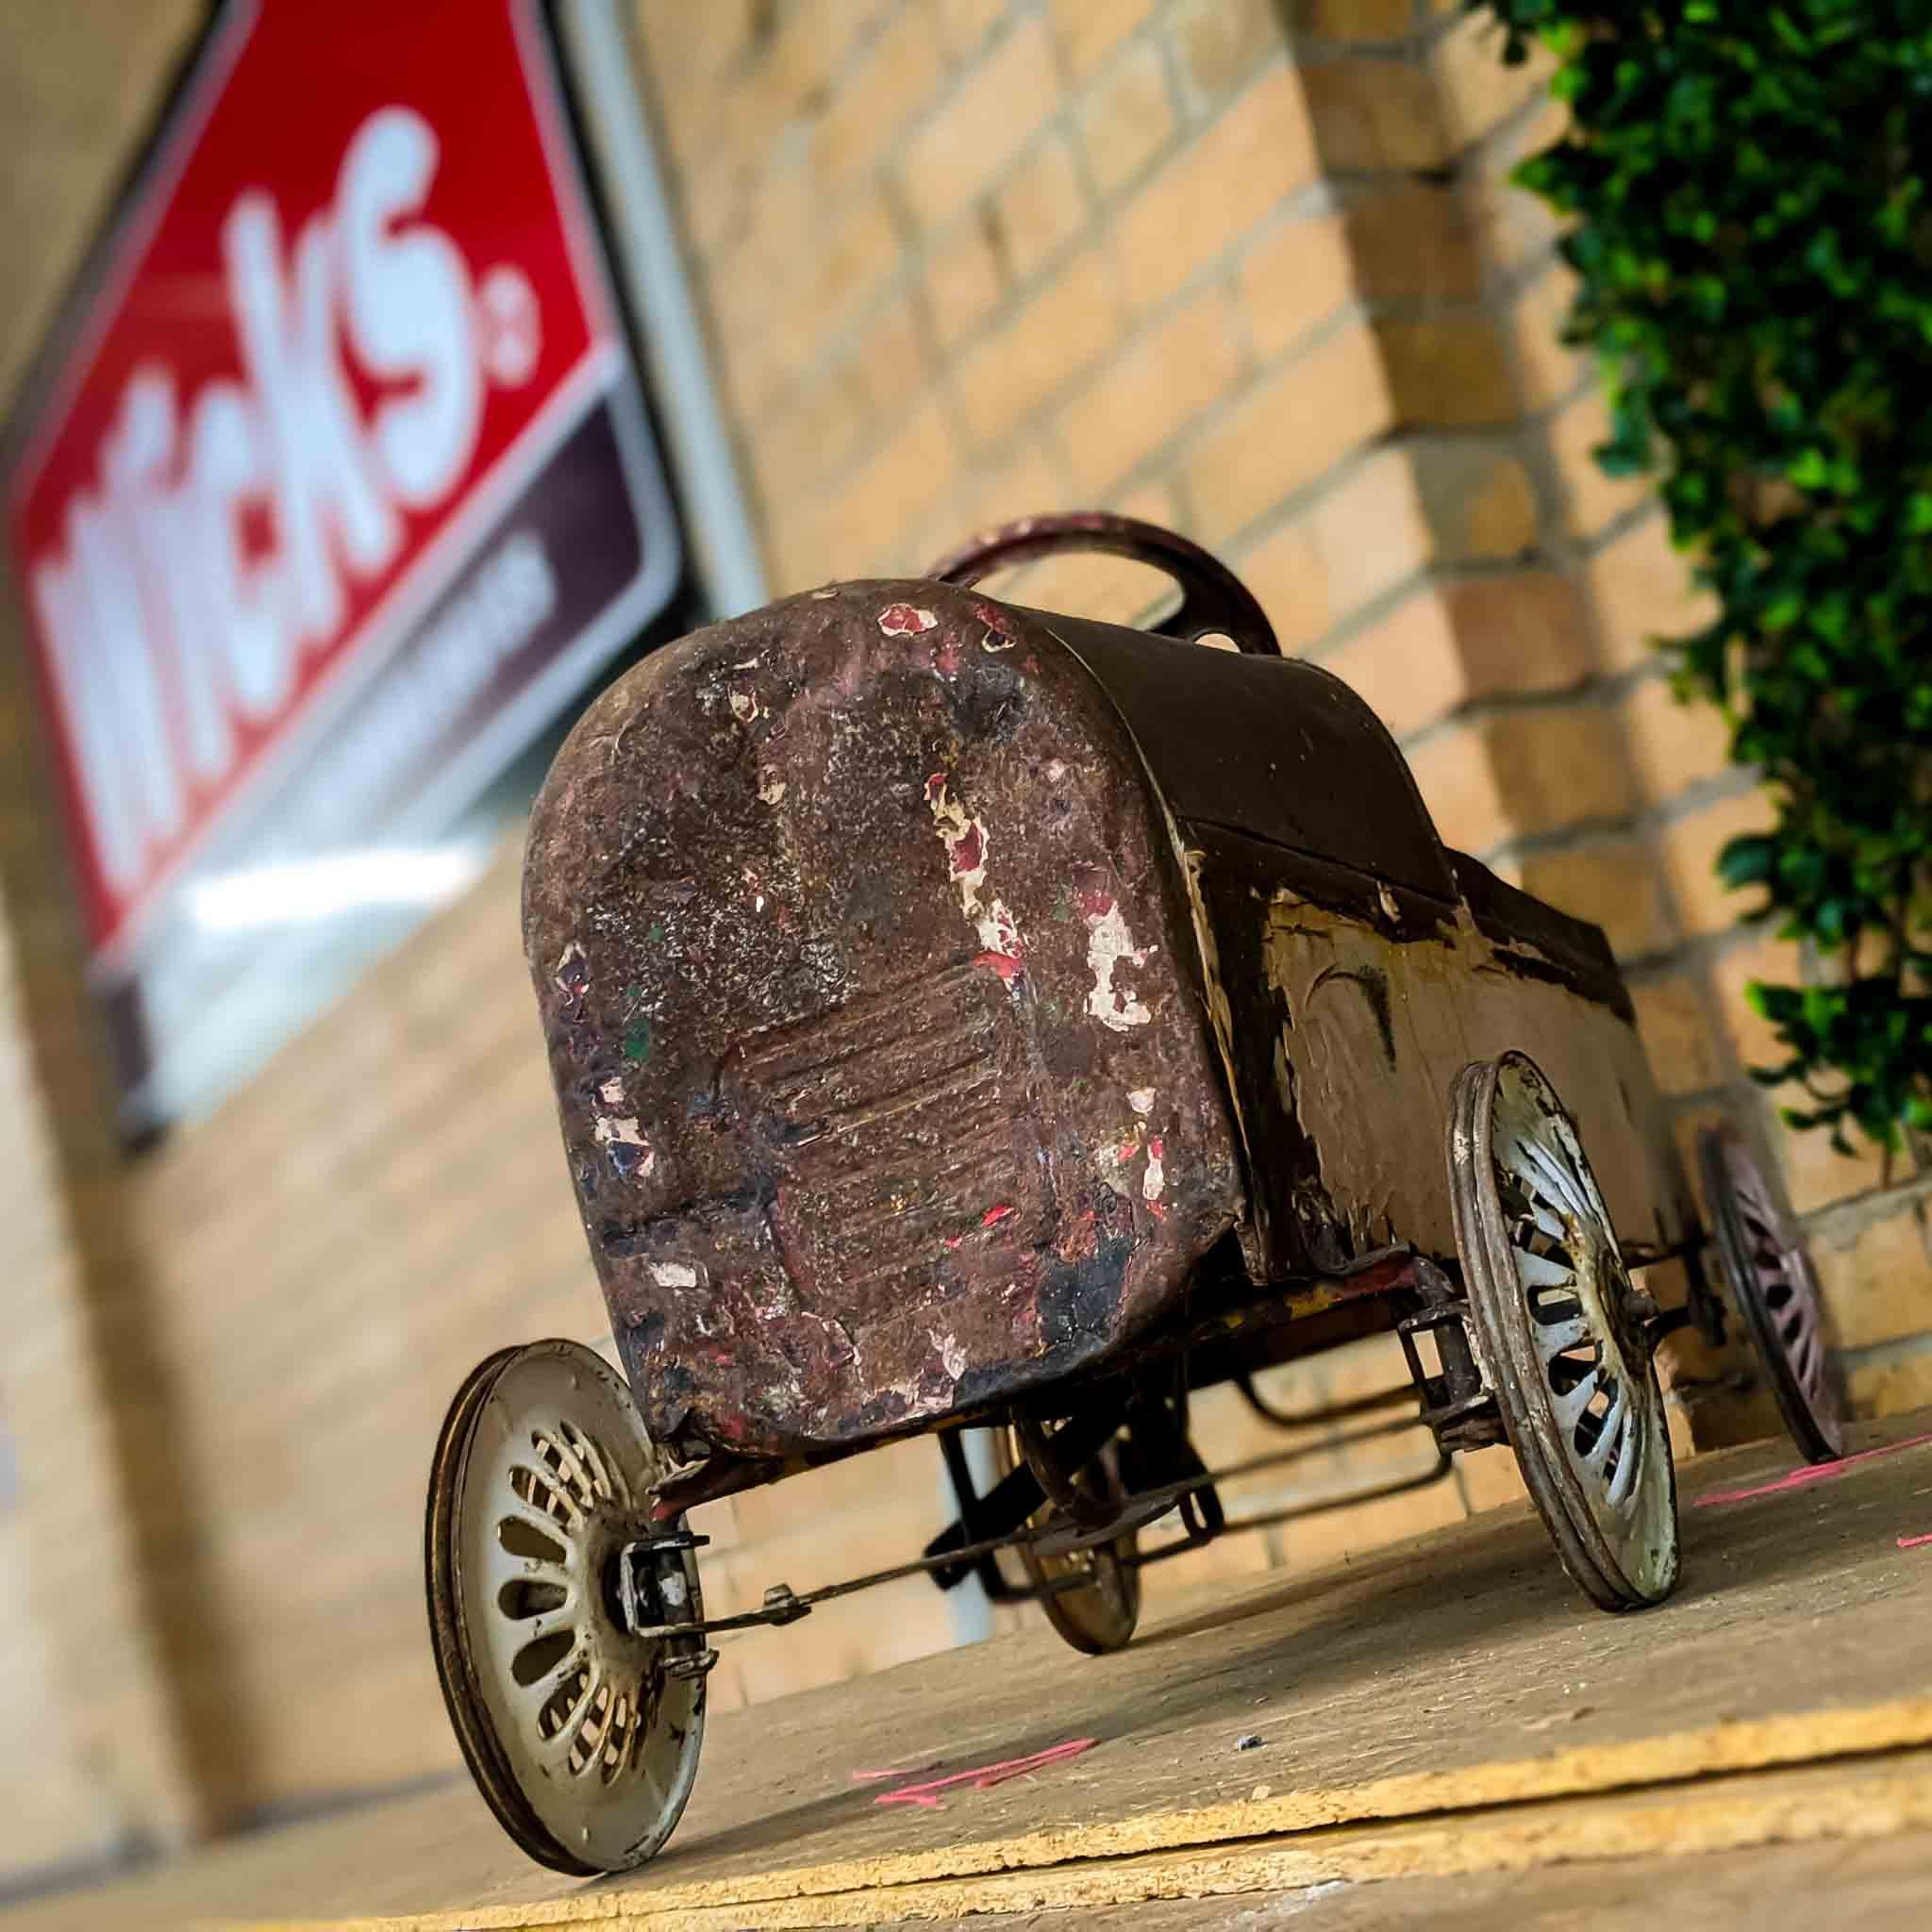 Benefits | #1 Great Car Servicing Benefits | Wicks Auto Tech